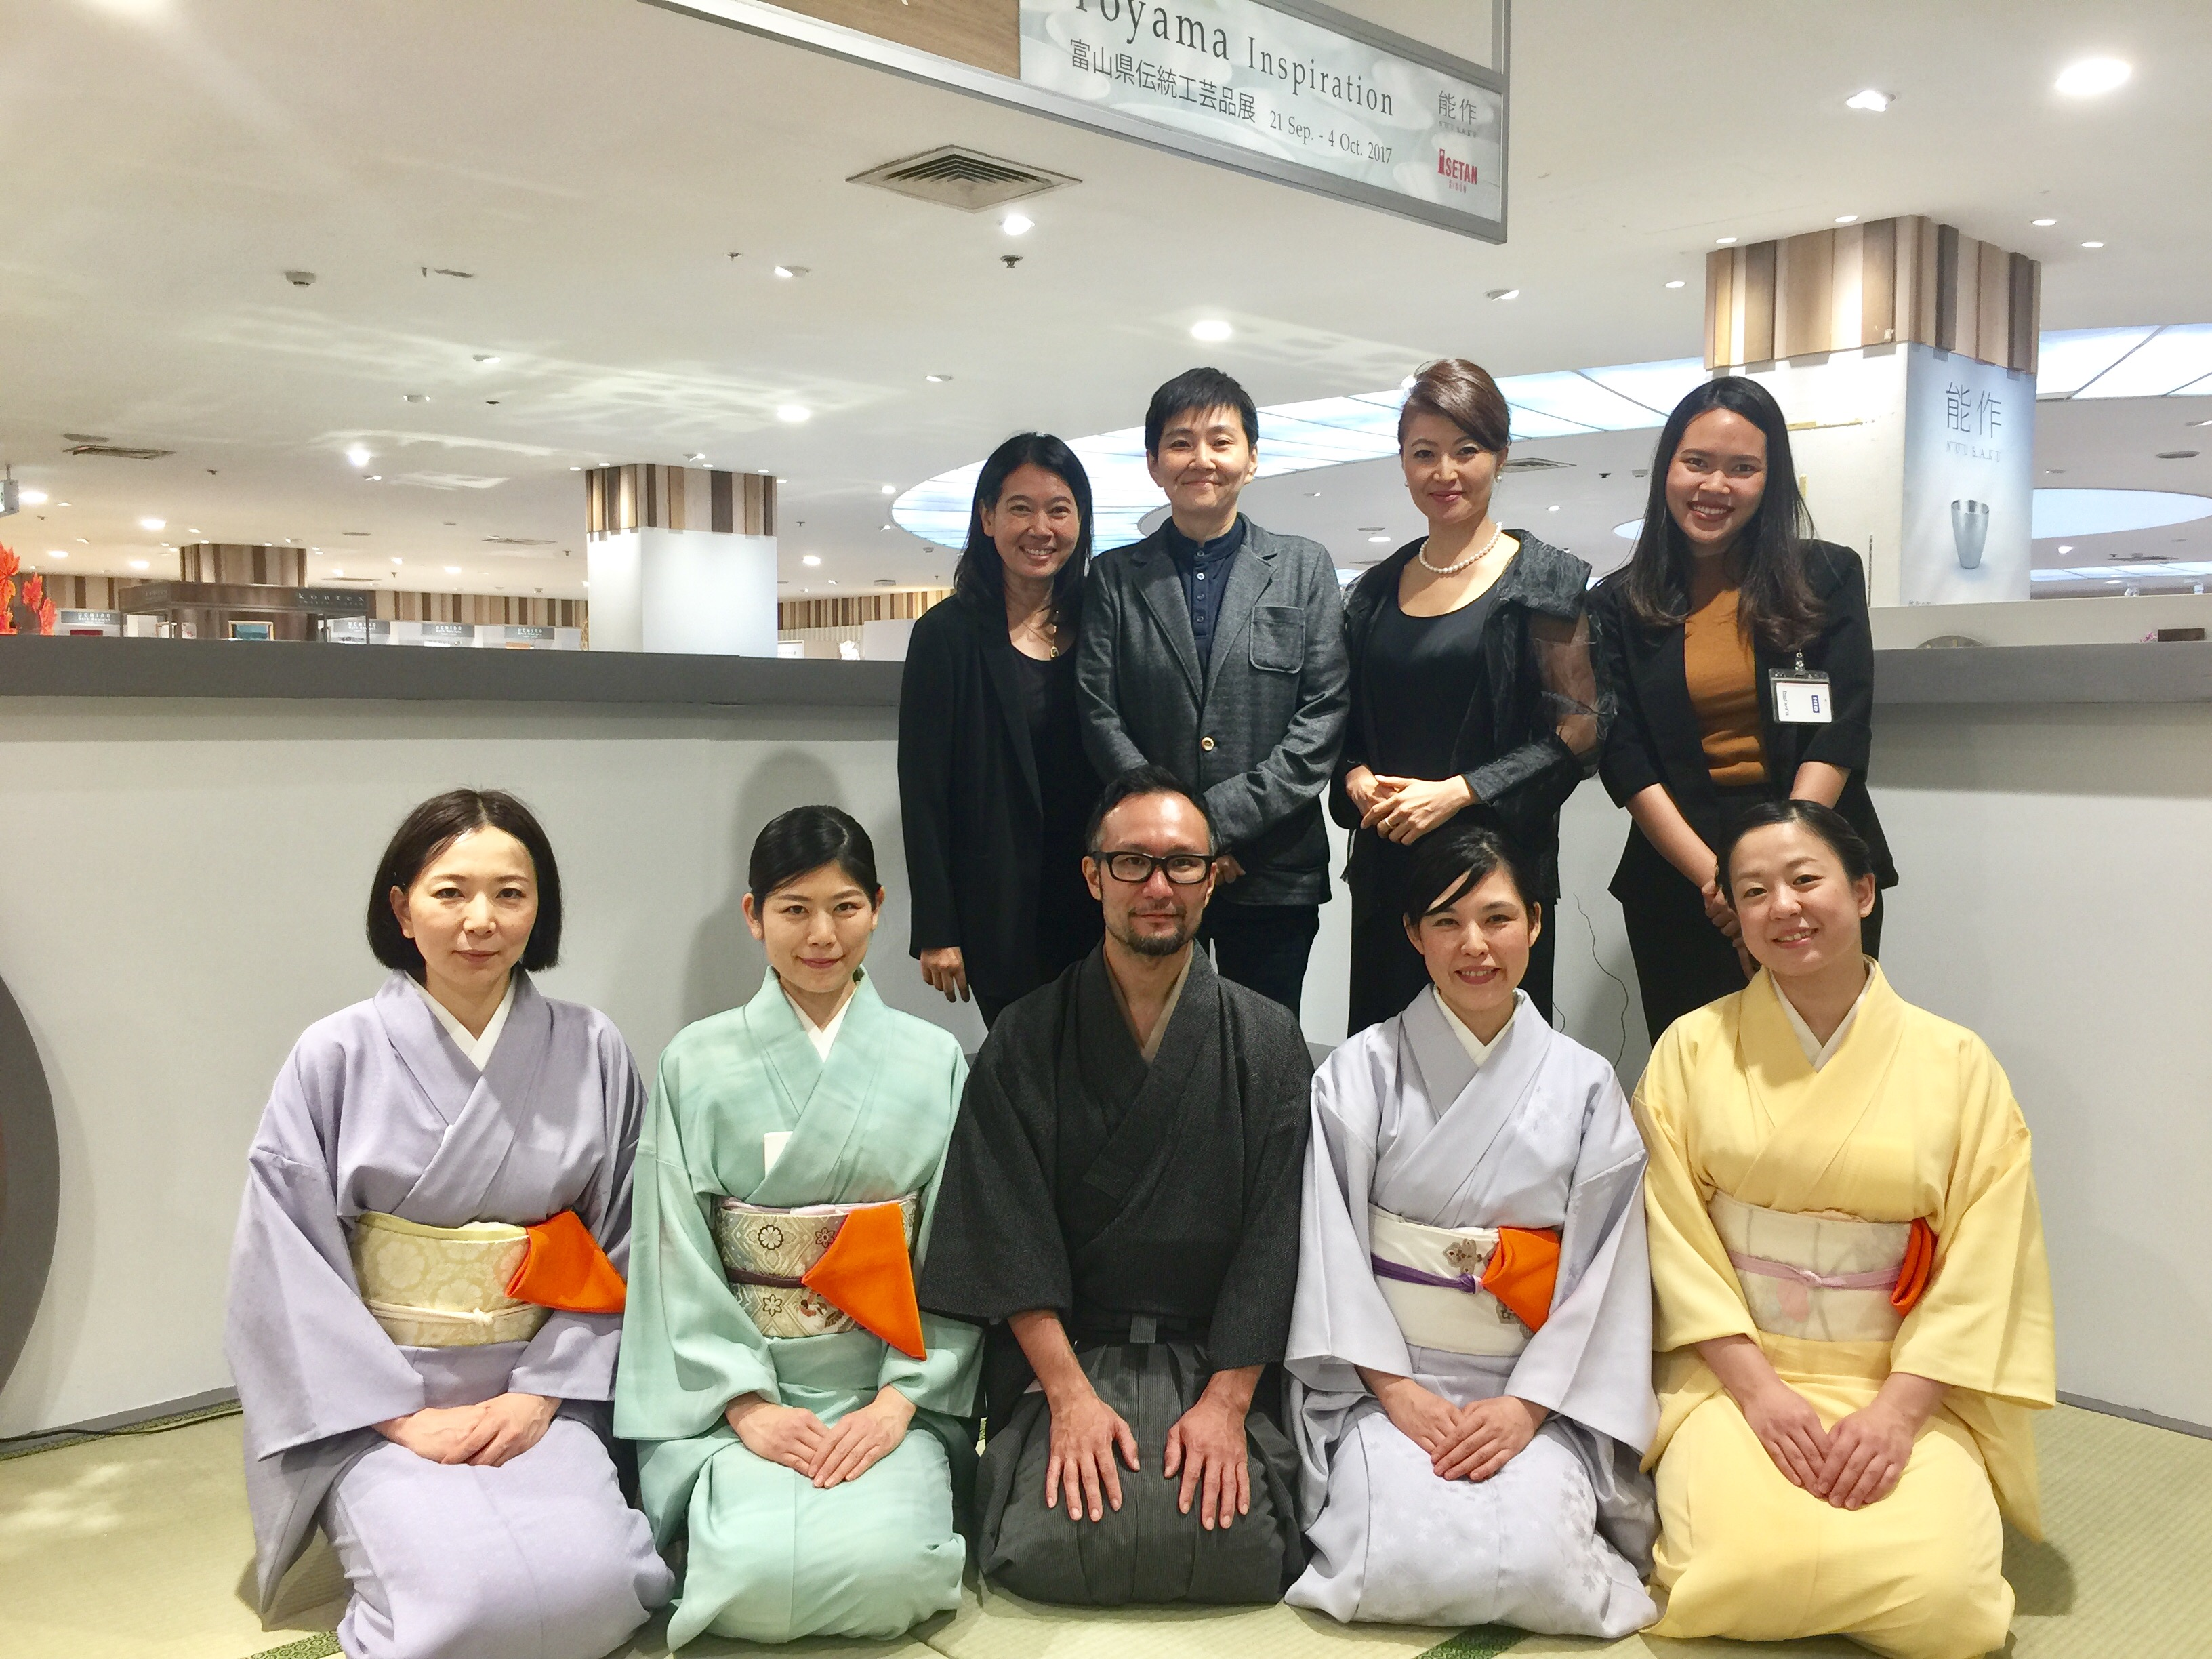 【Japanese Tea Ceremony with Tea Master・茶会】タイ・バンコク 伊勢丹にて